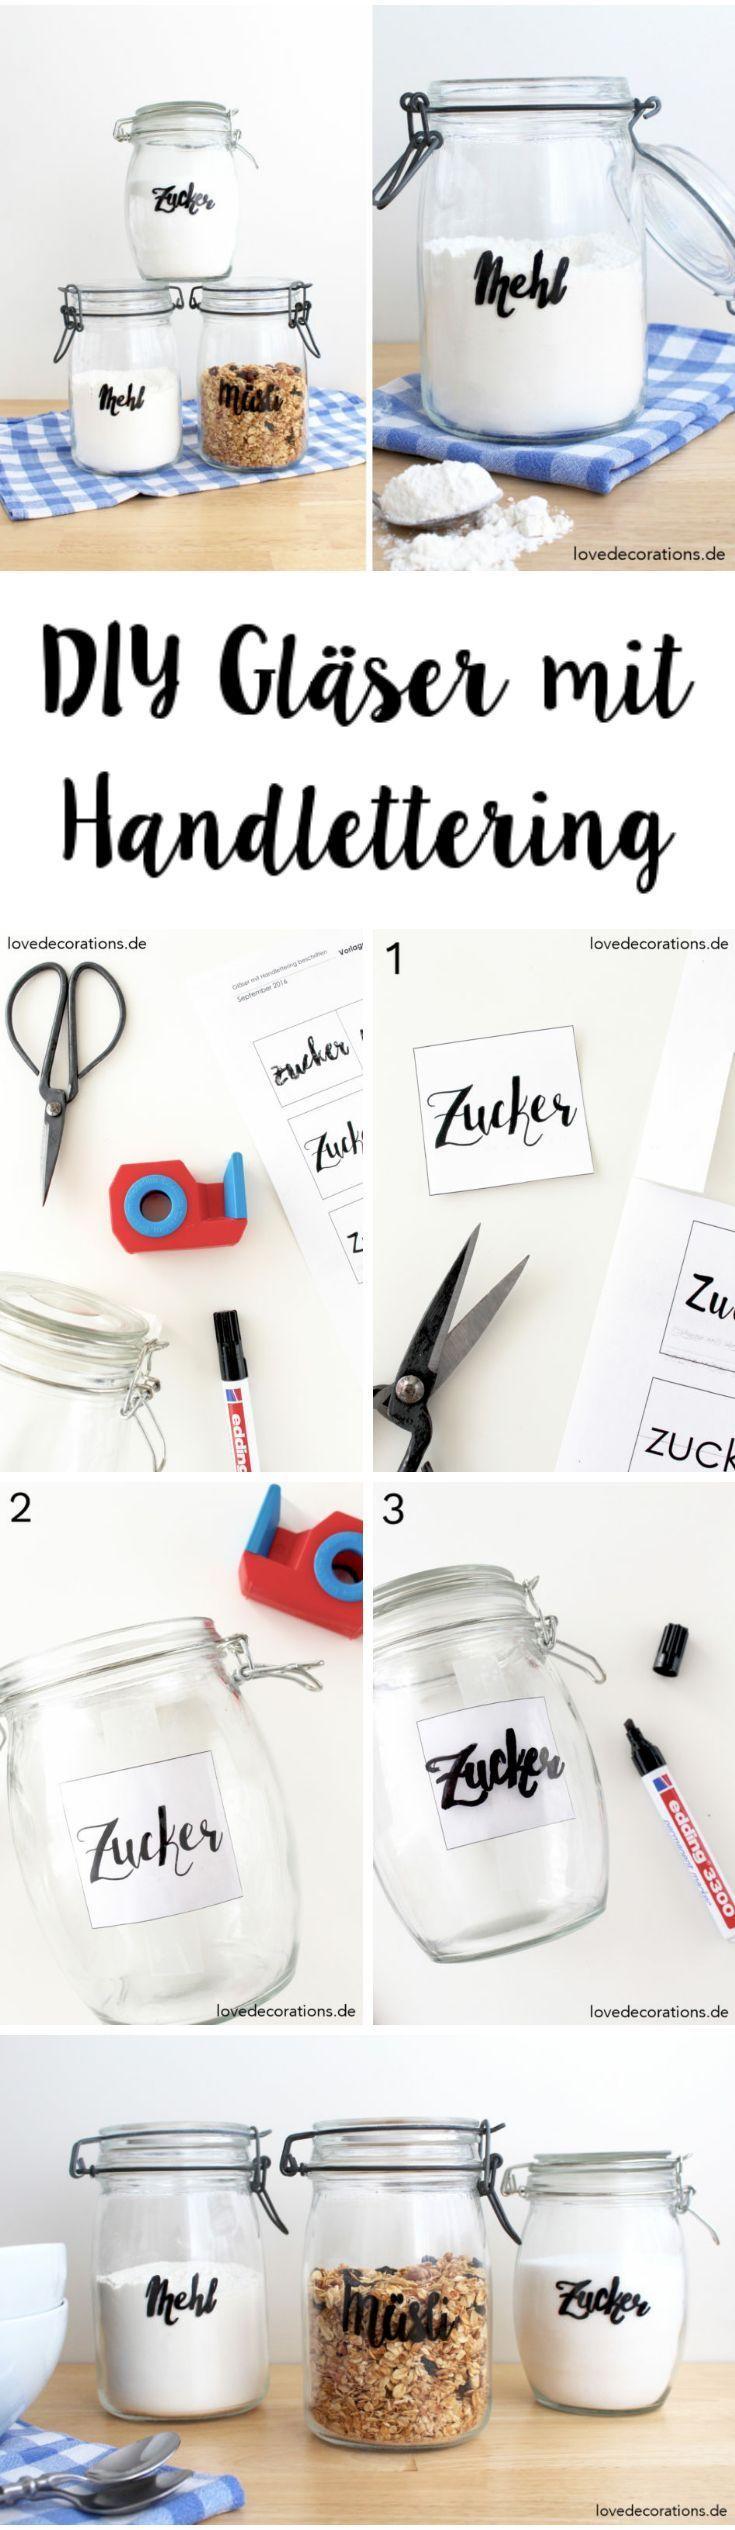 5 x 4 badezimmerdesigns  best  home  organized  images on pinterest  organization